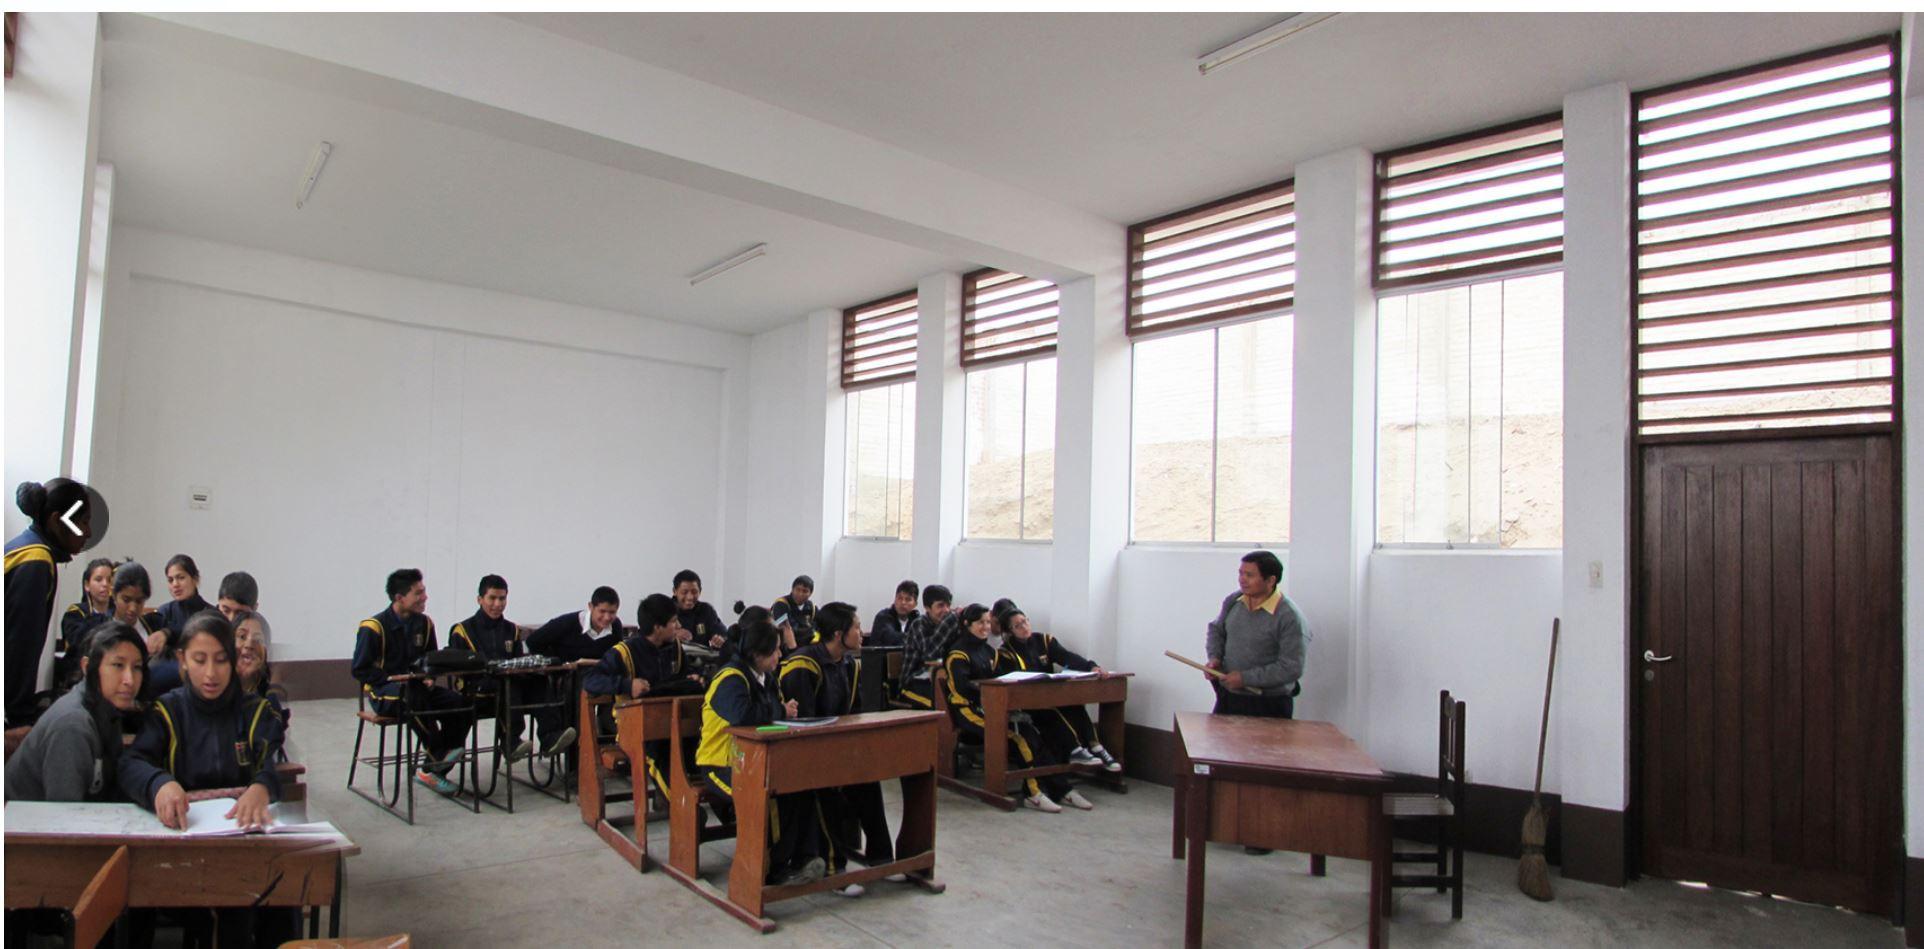 1_Classroom.JPG